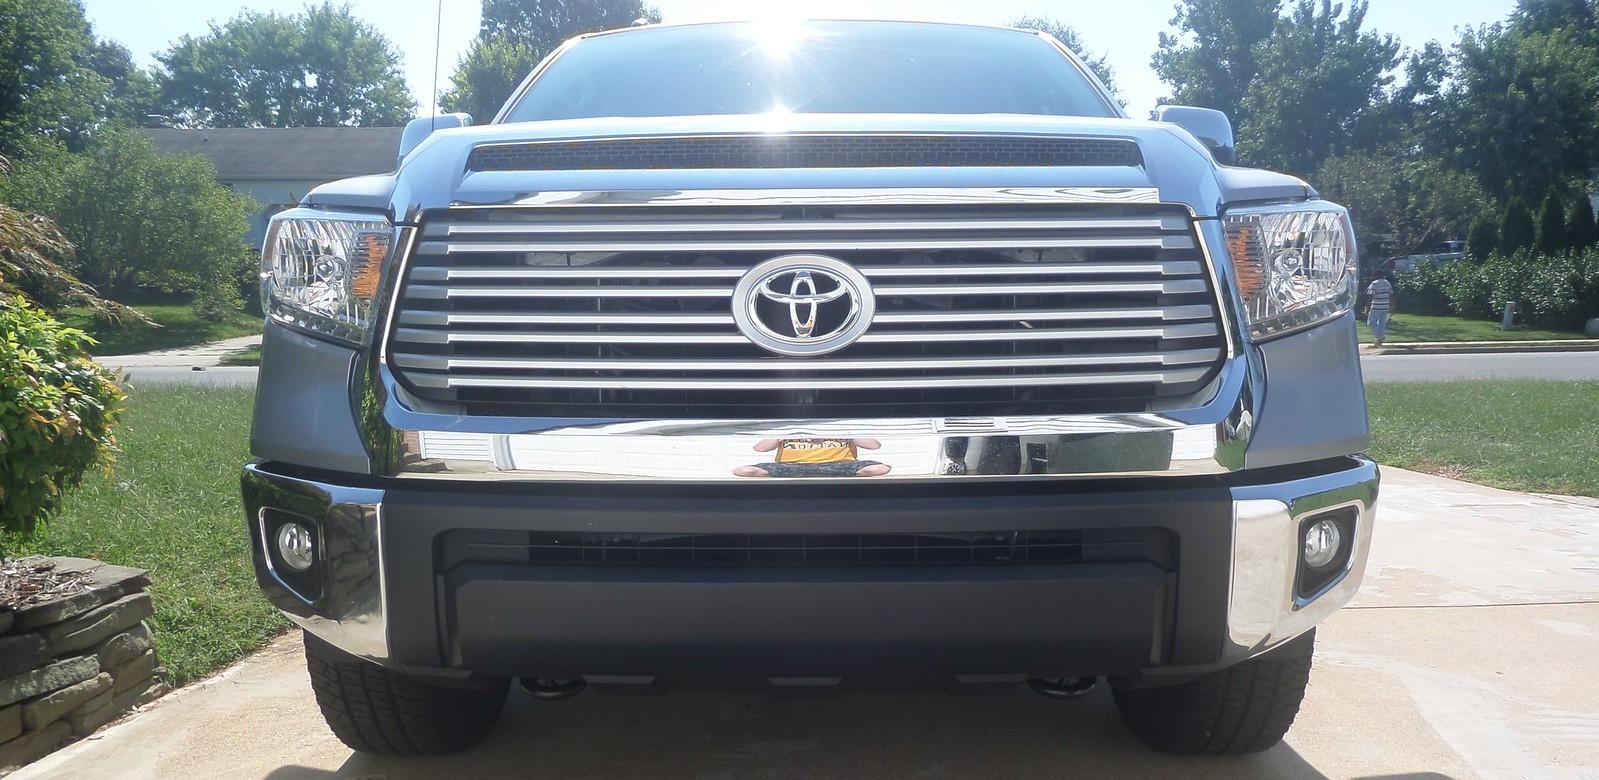 silver sky black out or chrome? - TundraTalk net - Toyota